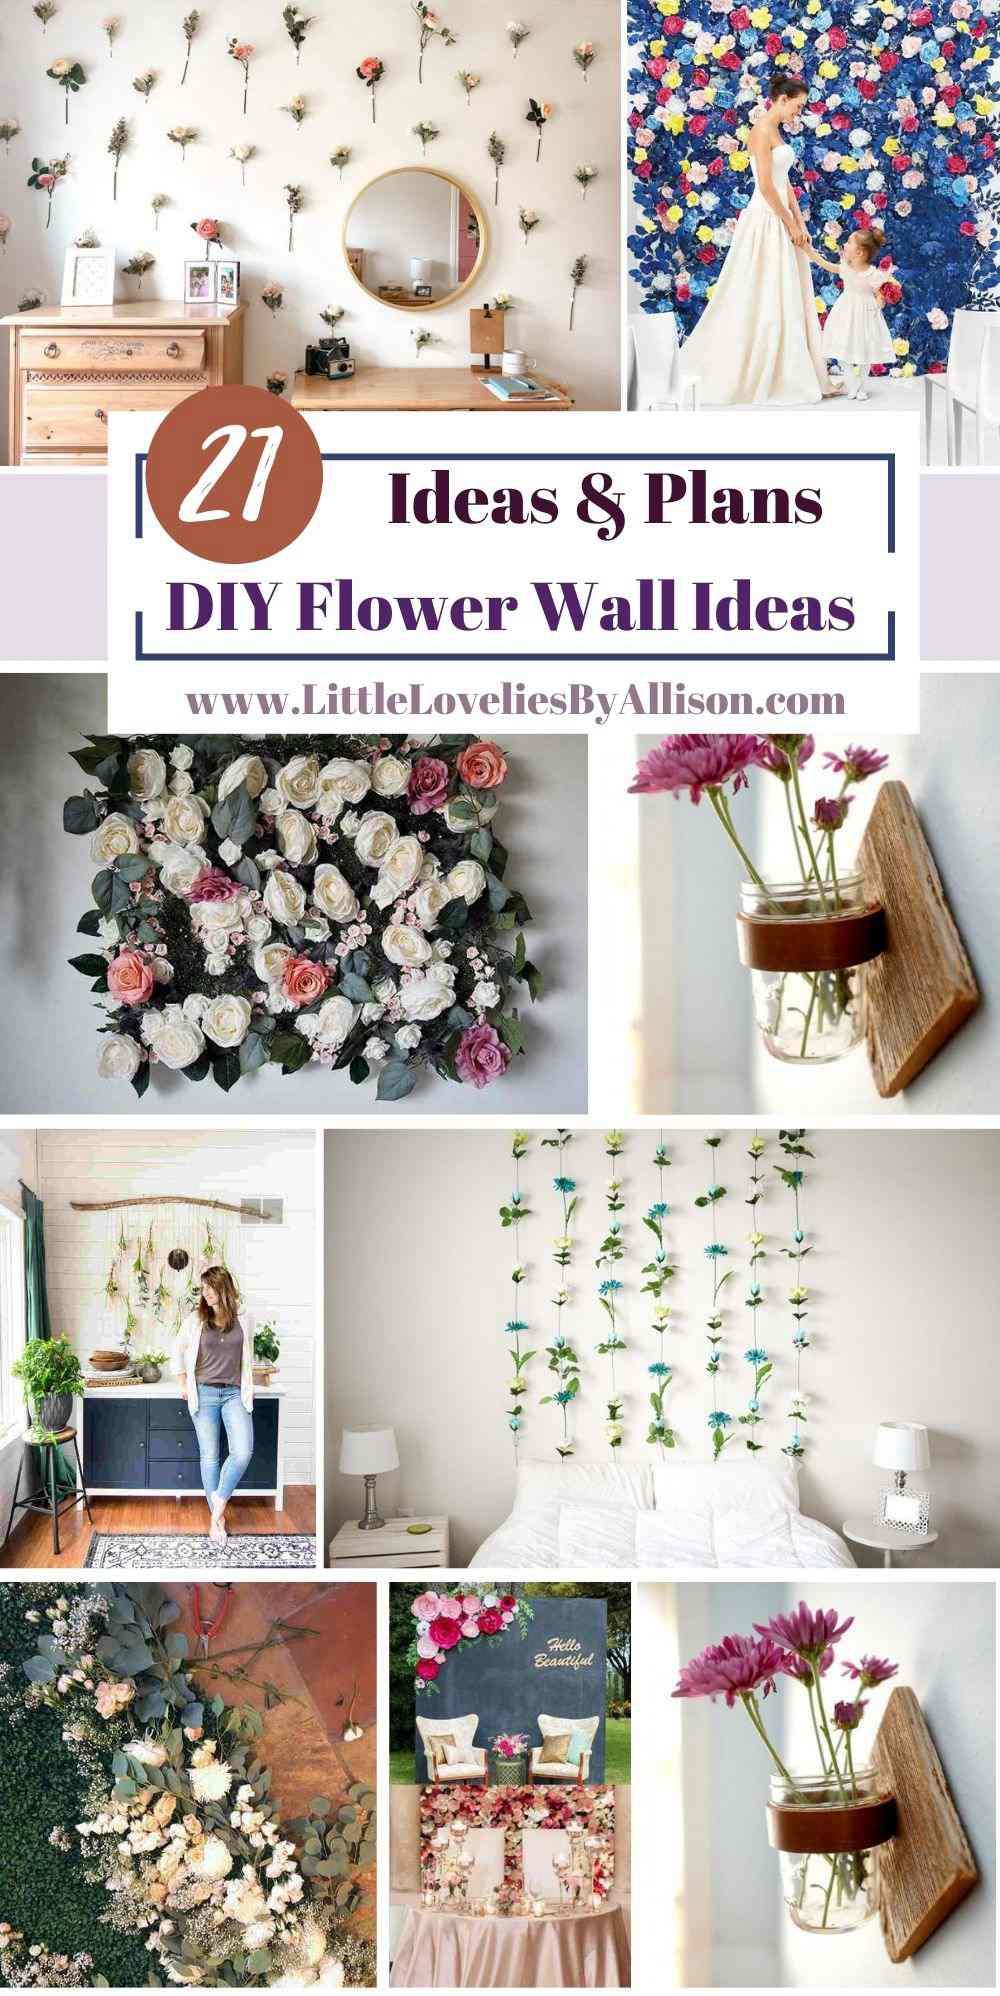 21 Self-Implementing DIY Flower Wall Ideas